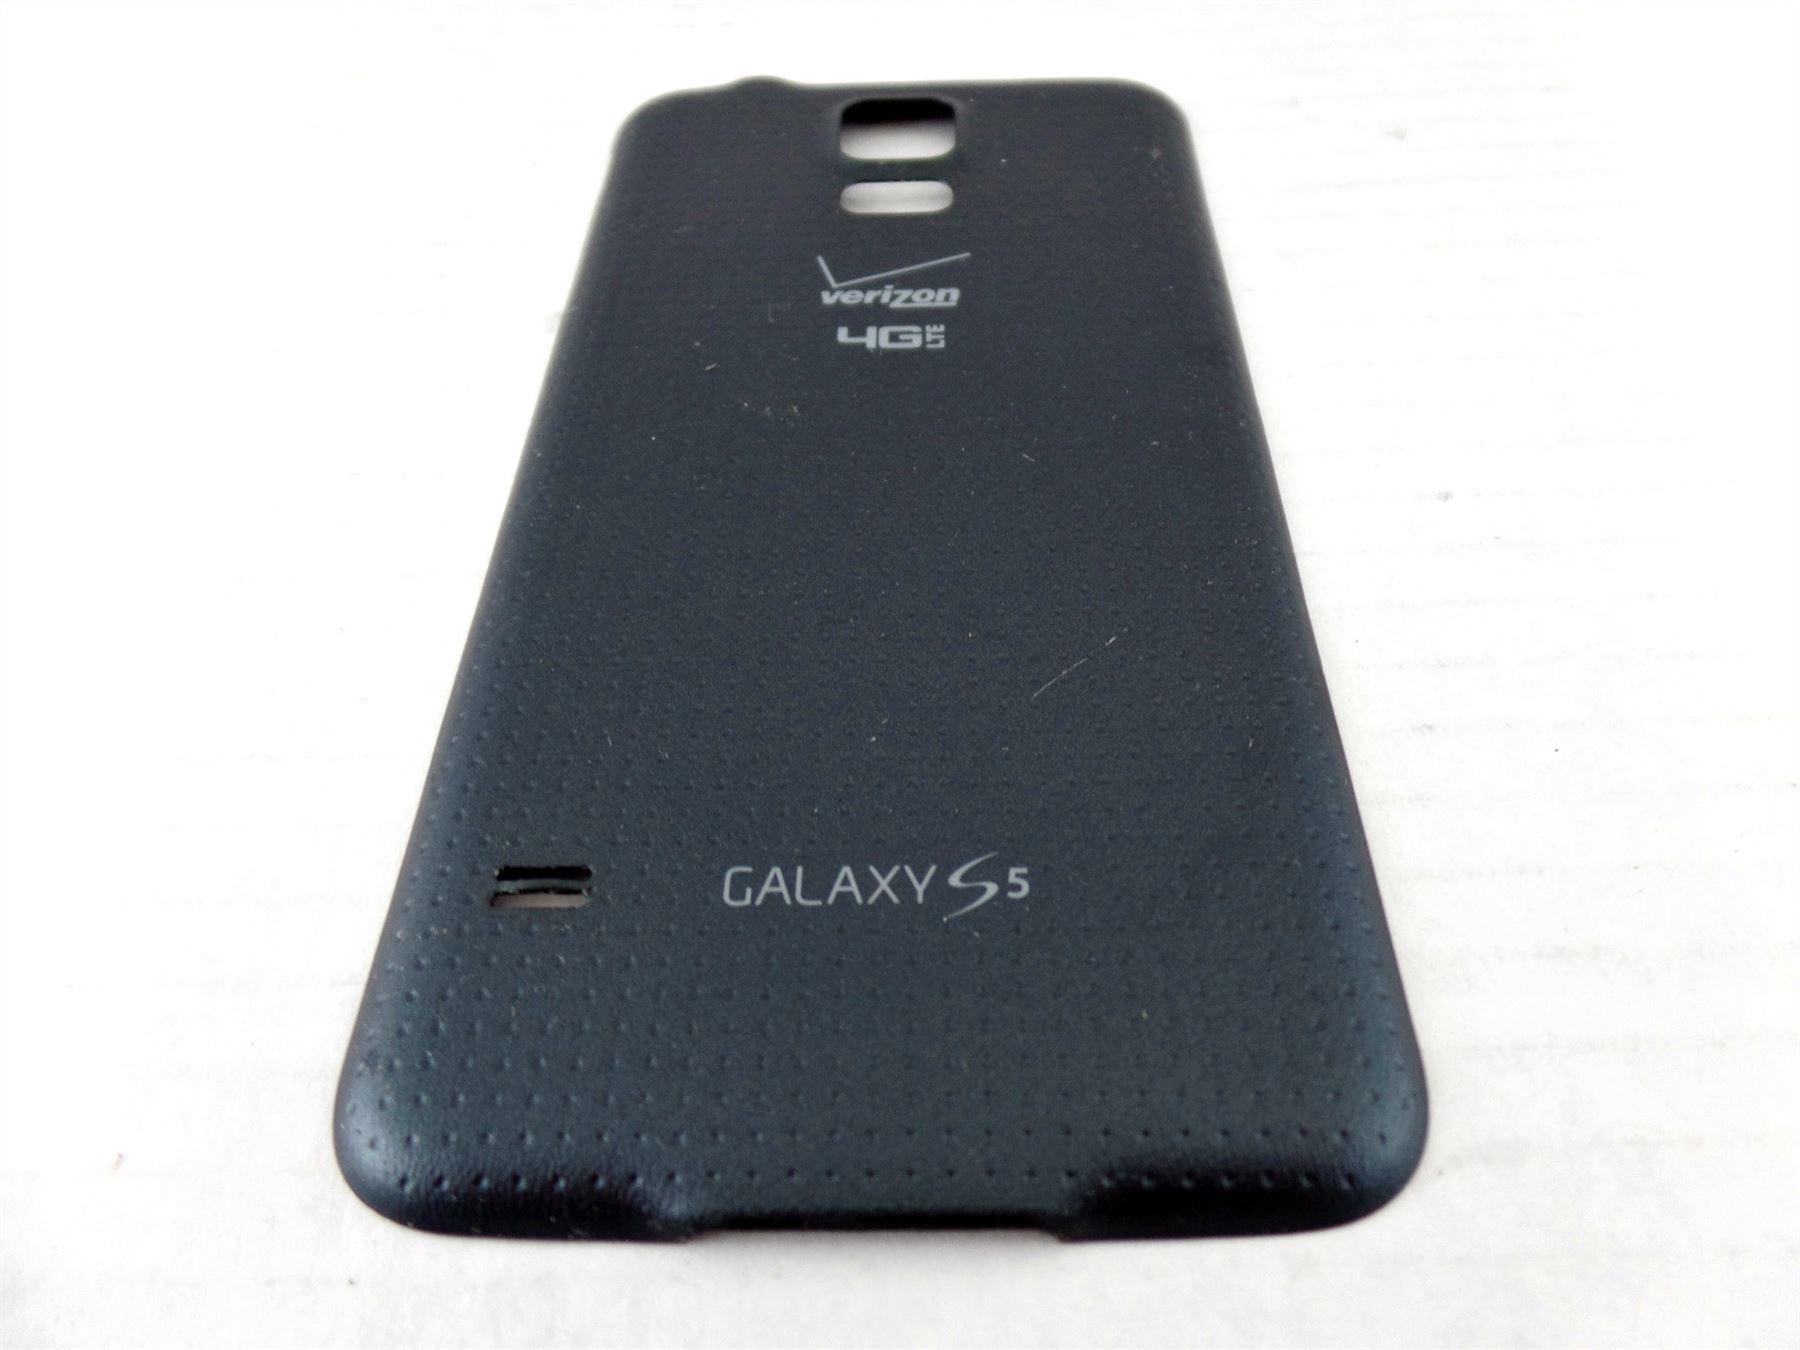 Samsung galaxy battery s3 verizon - Samsung Galaxy S5 Verizon Battery Back Door Housing